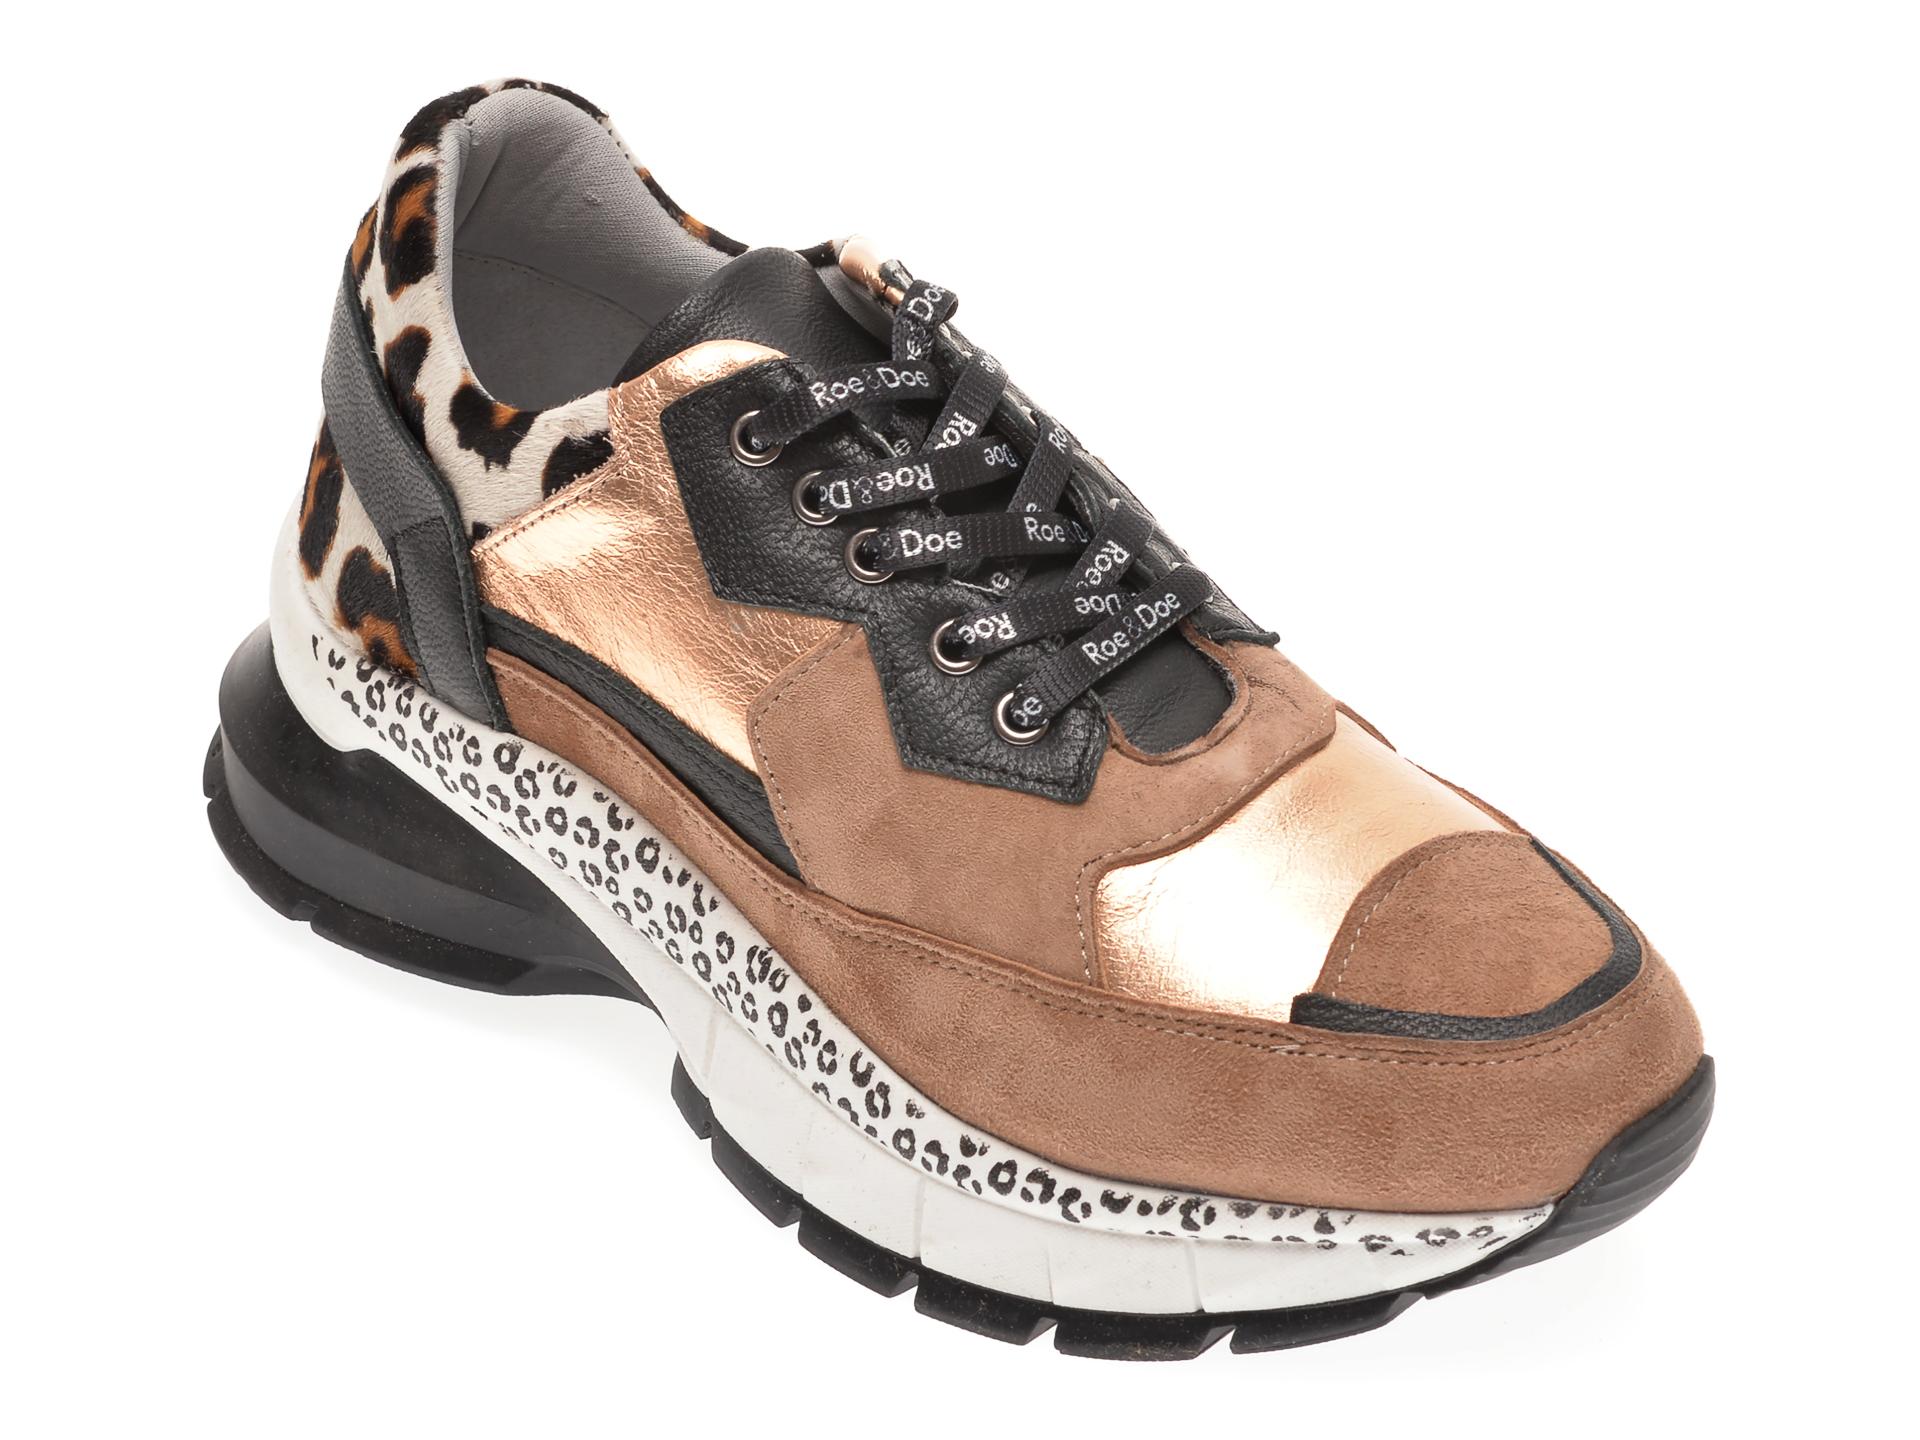 Pantofi sport BABOOS maro, 1202, din piele naturala imagine